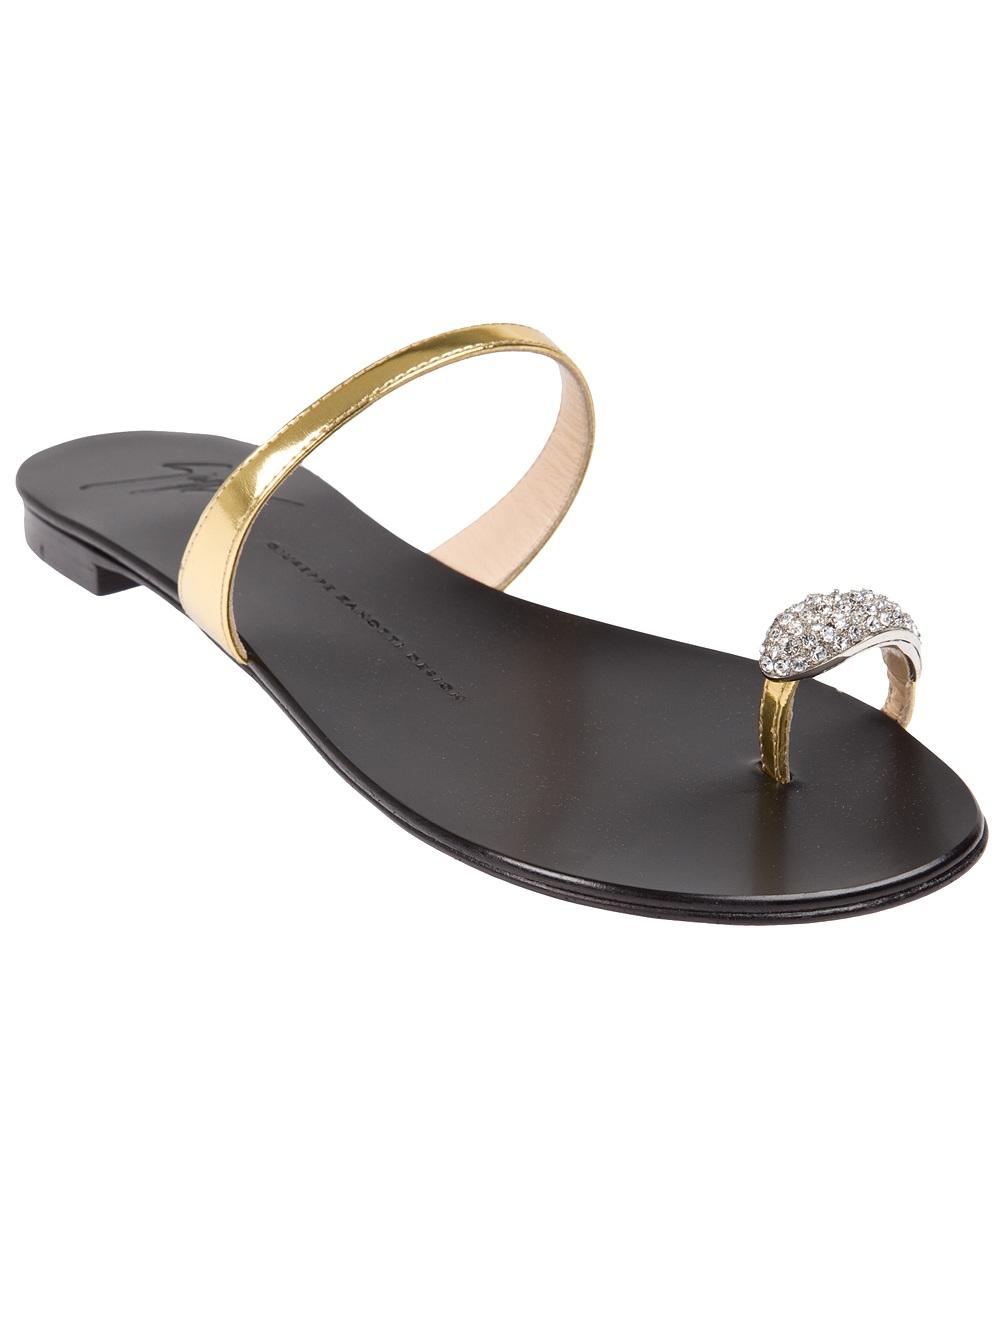 4bdc240469511 Giuseppe Zanotti Toe Ring Sandal in Metallic - Lyst